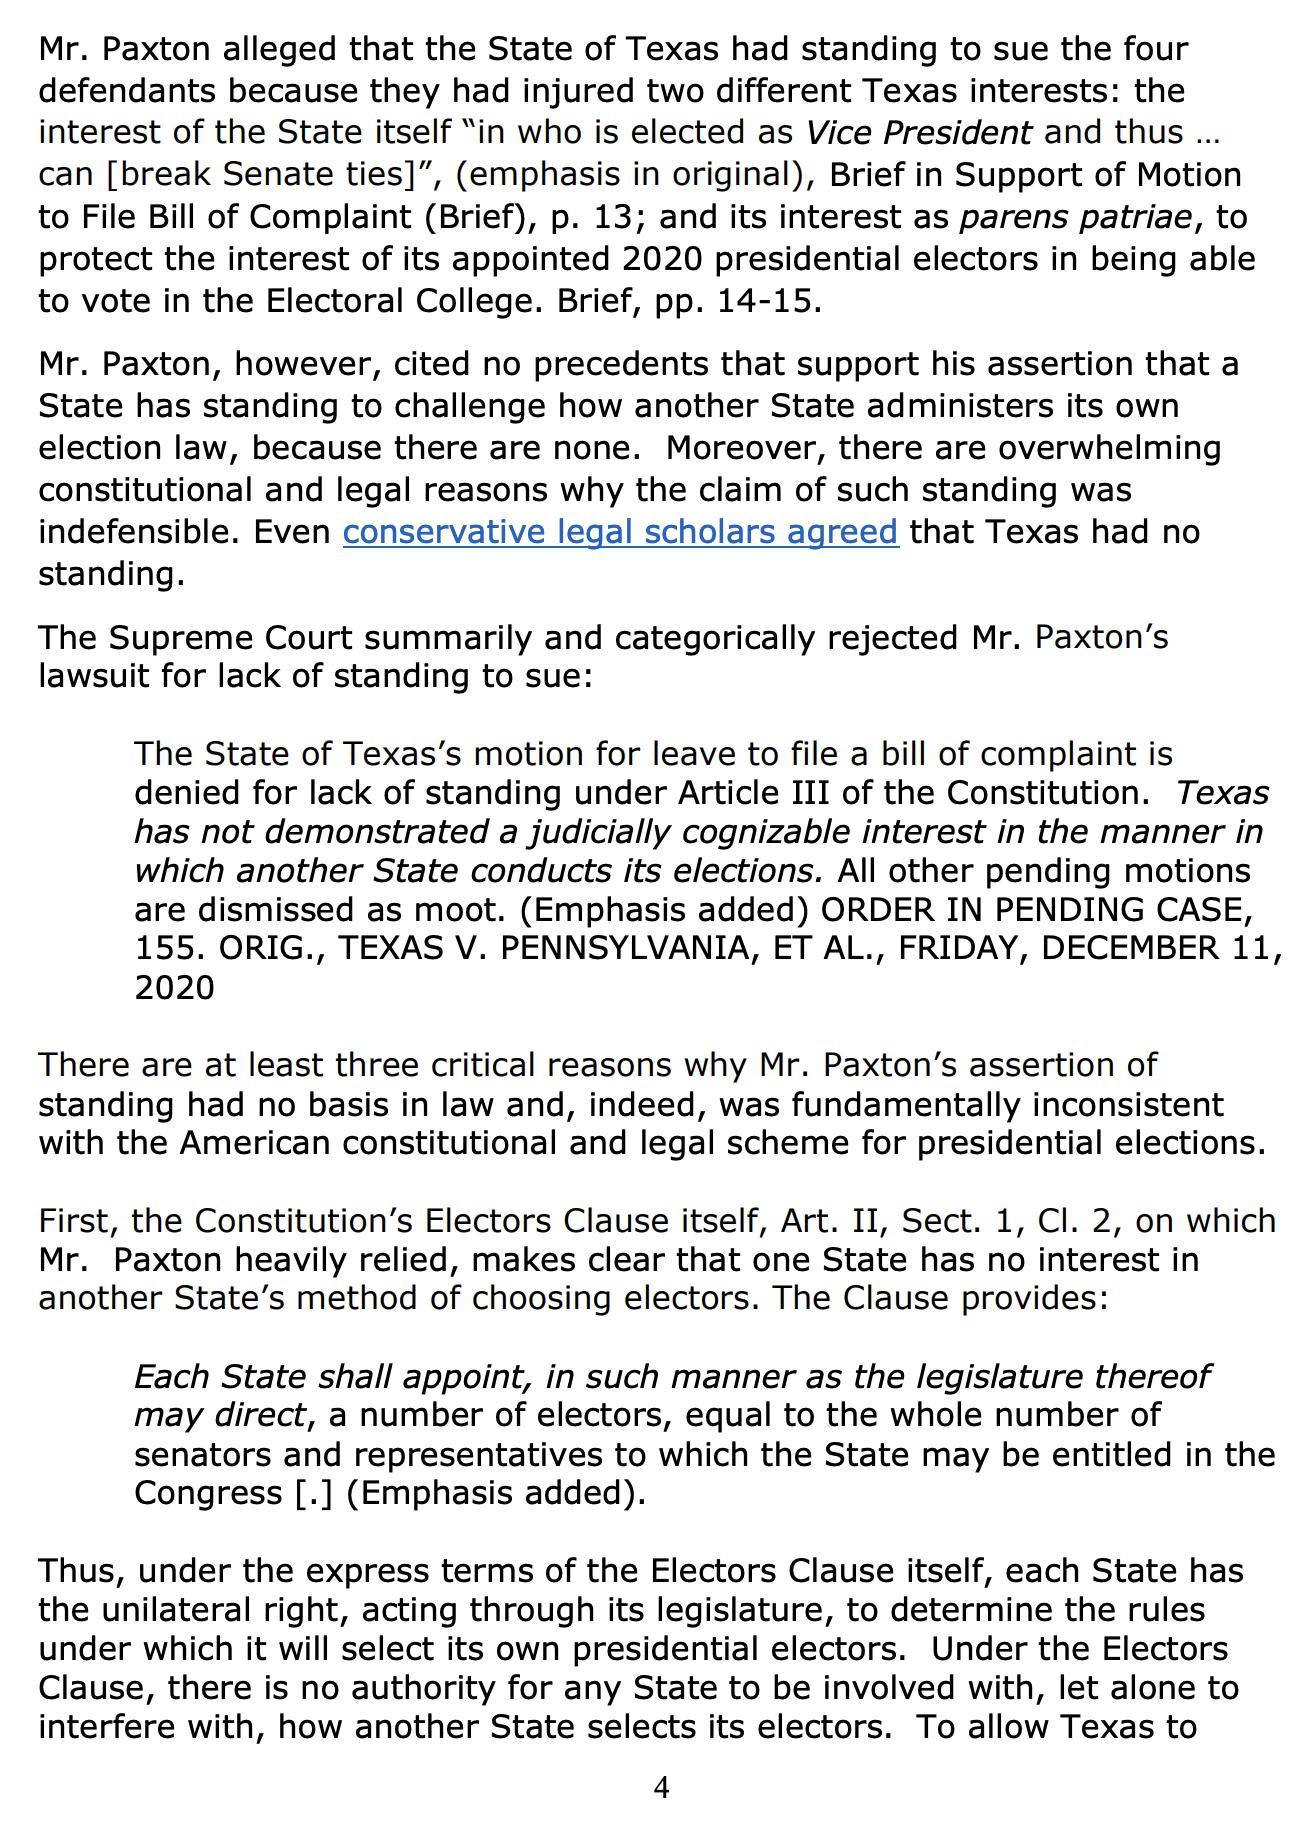 Screen-Shot-2021-08-31-at-10.02.51-AM Texas State Bar Puts AG Ken Paxton Under Immediate Investigation Crime Donald Trump Featured Politics Top Stories